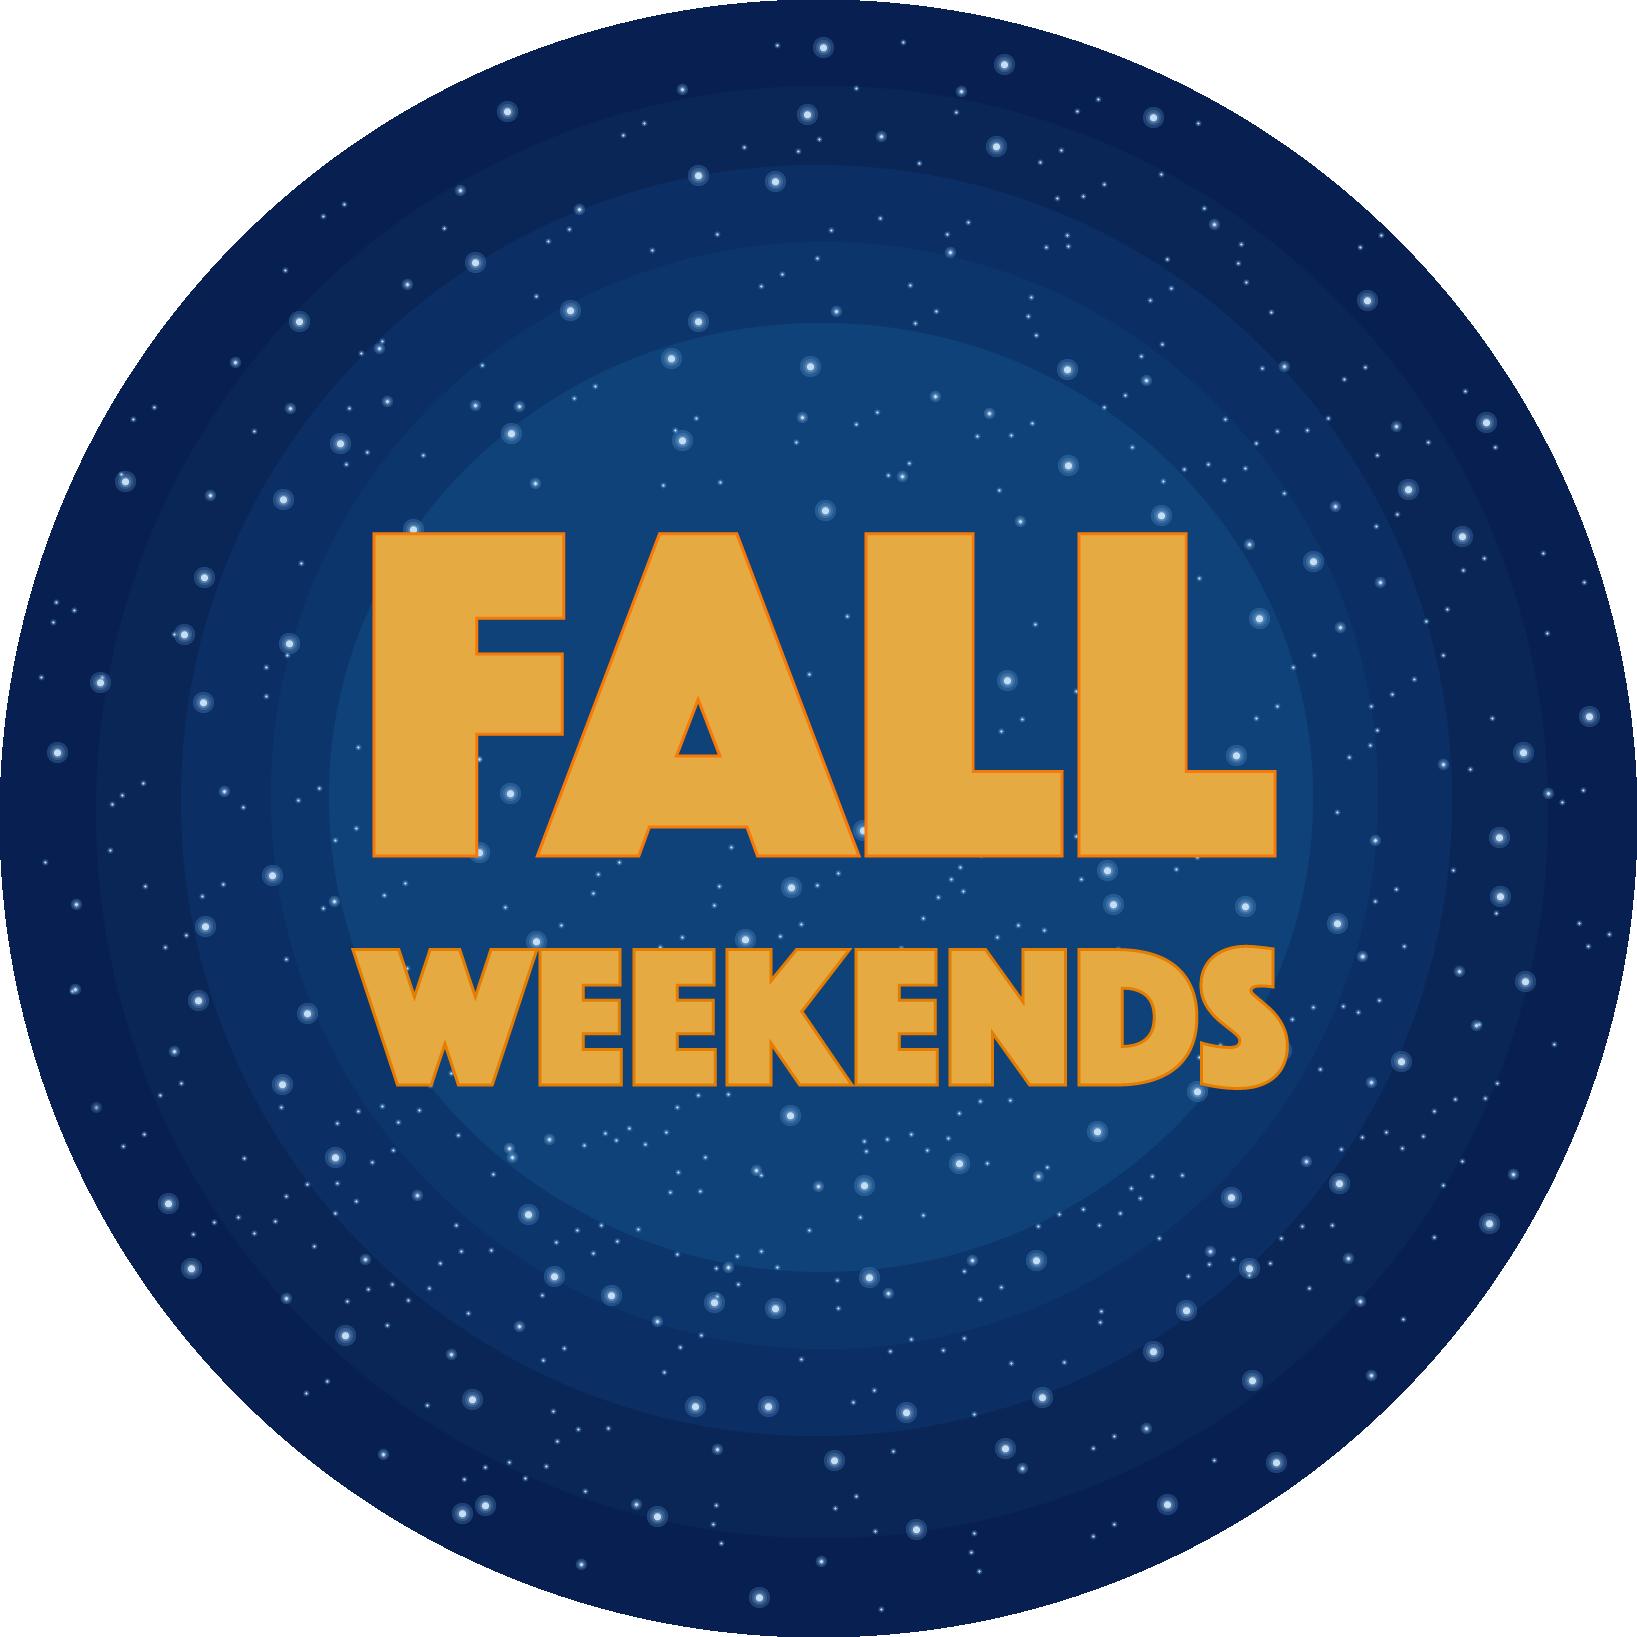 Fall Weekends 2019